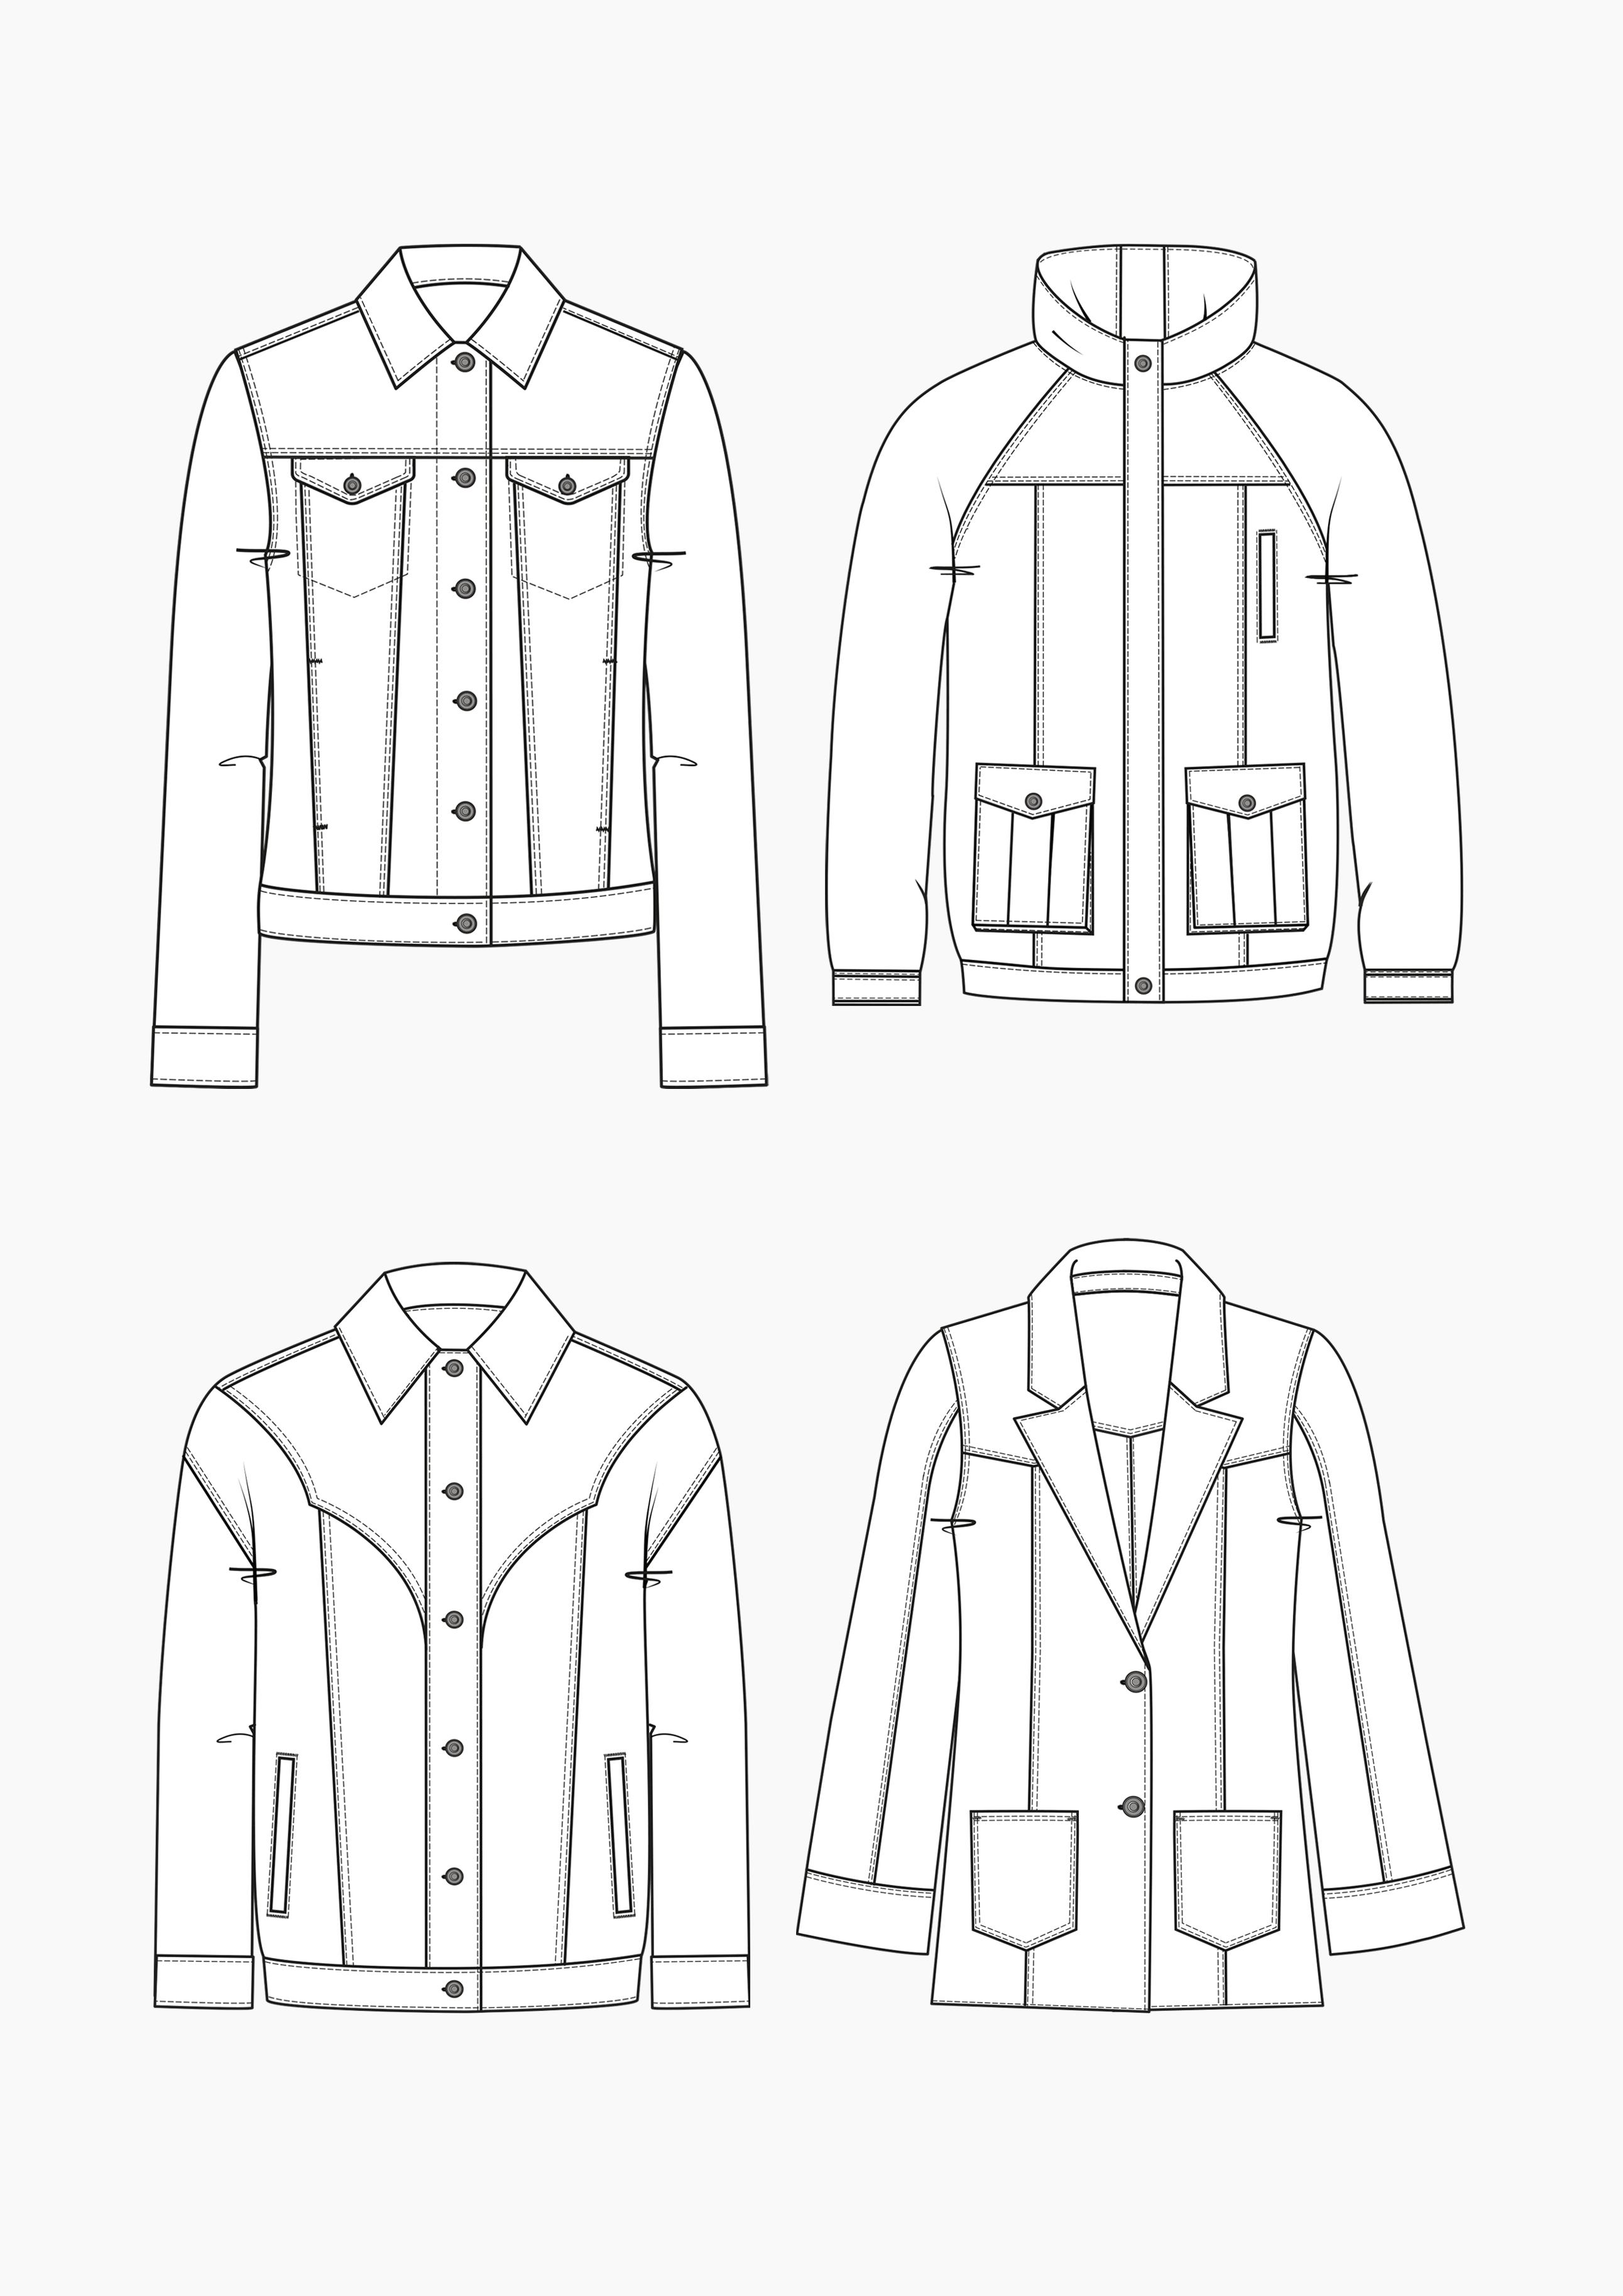 Produkt: Schnitt-Technik Jeansjacken